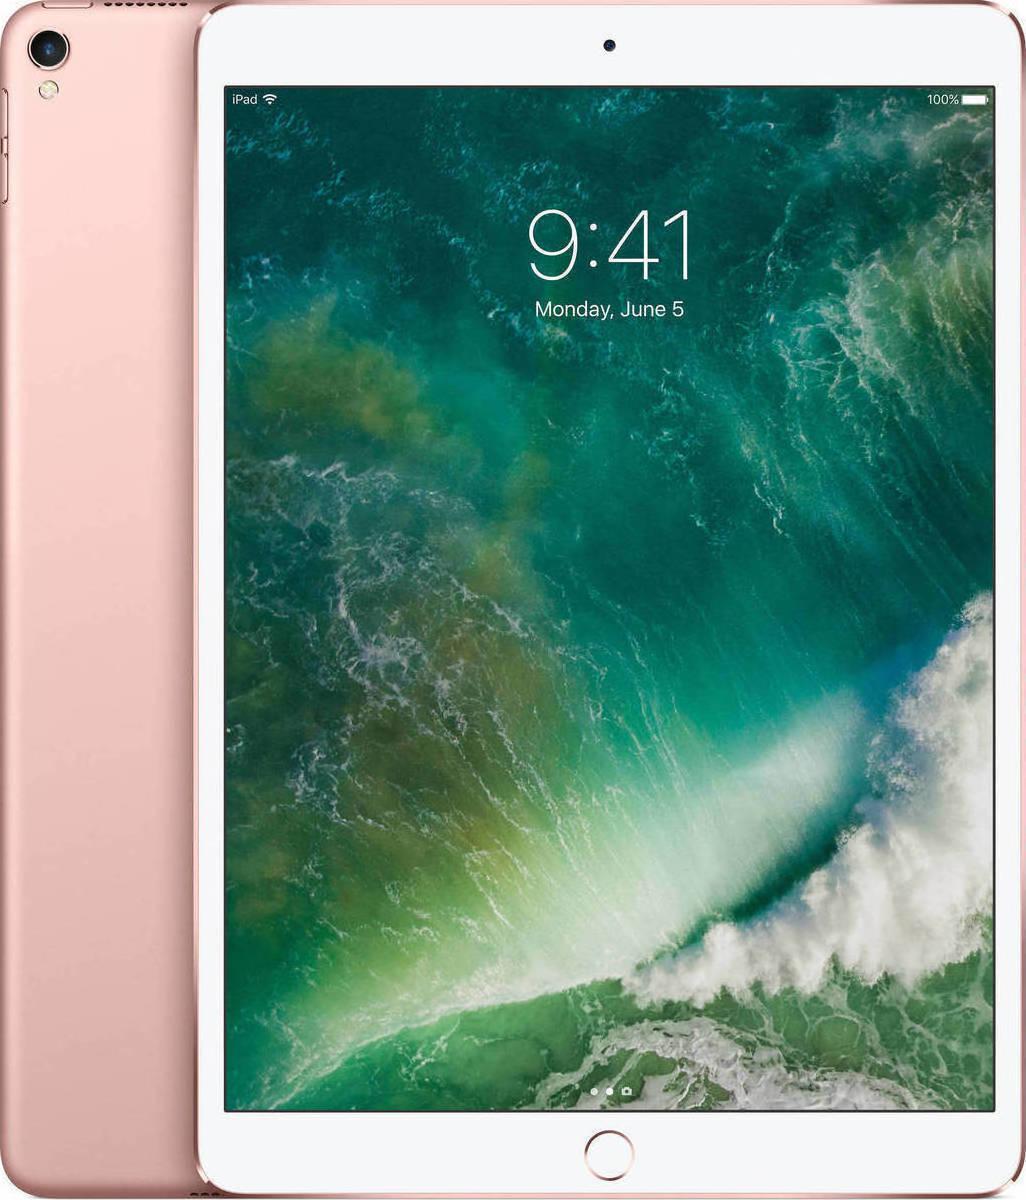 Apple iPad Pro 12.9'' 2017 WiFi and Cellular 512GB Rose Gold Με Αντάπτορα Πληρωμή έως 24 δόσεις